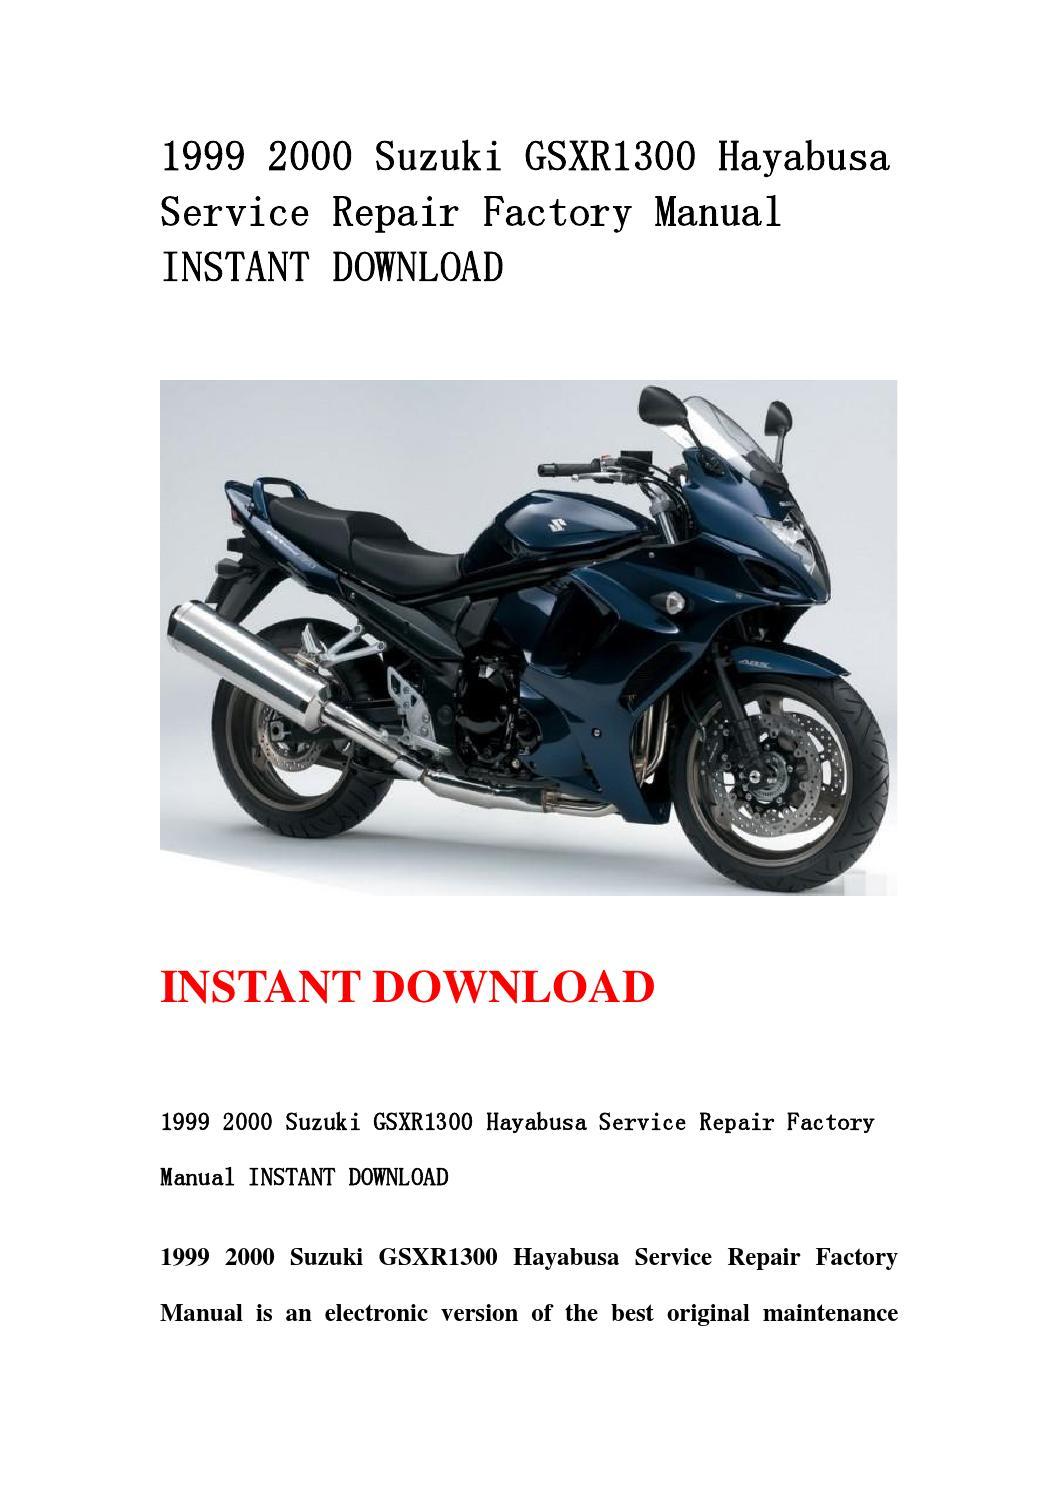 1999 2000 suzuki gsxr1300 hayabusa service repair factory manual instant  download by jfhnn mkjnd - issuu